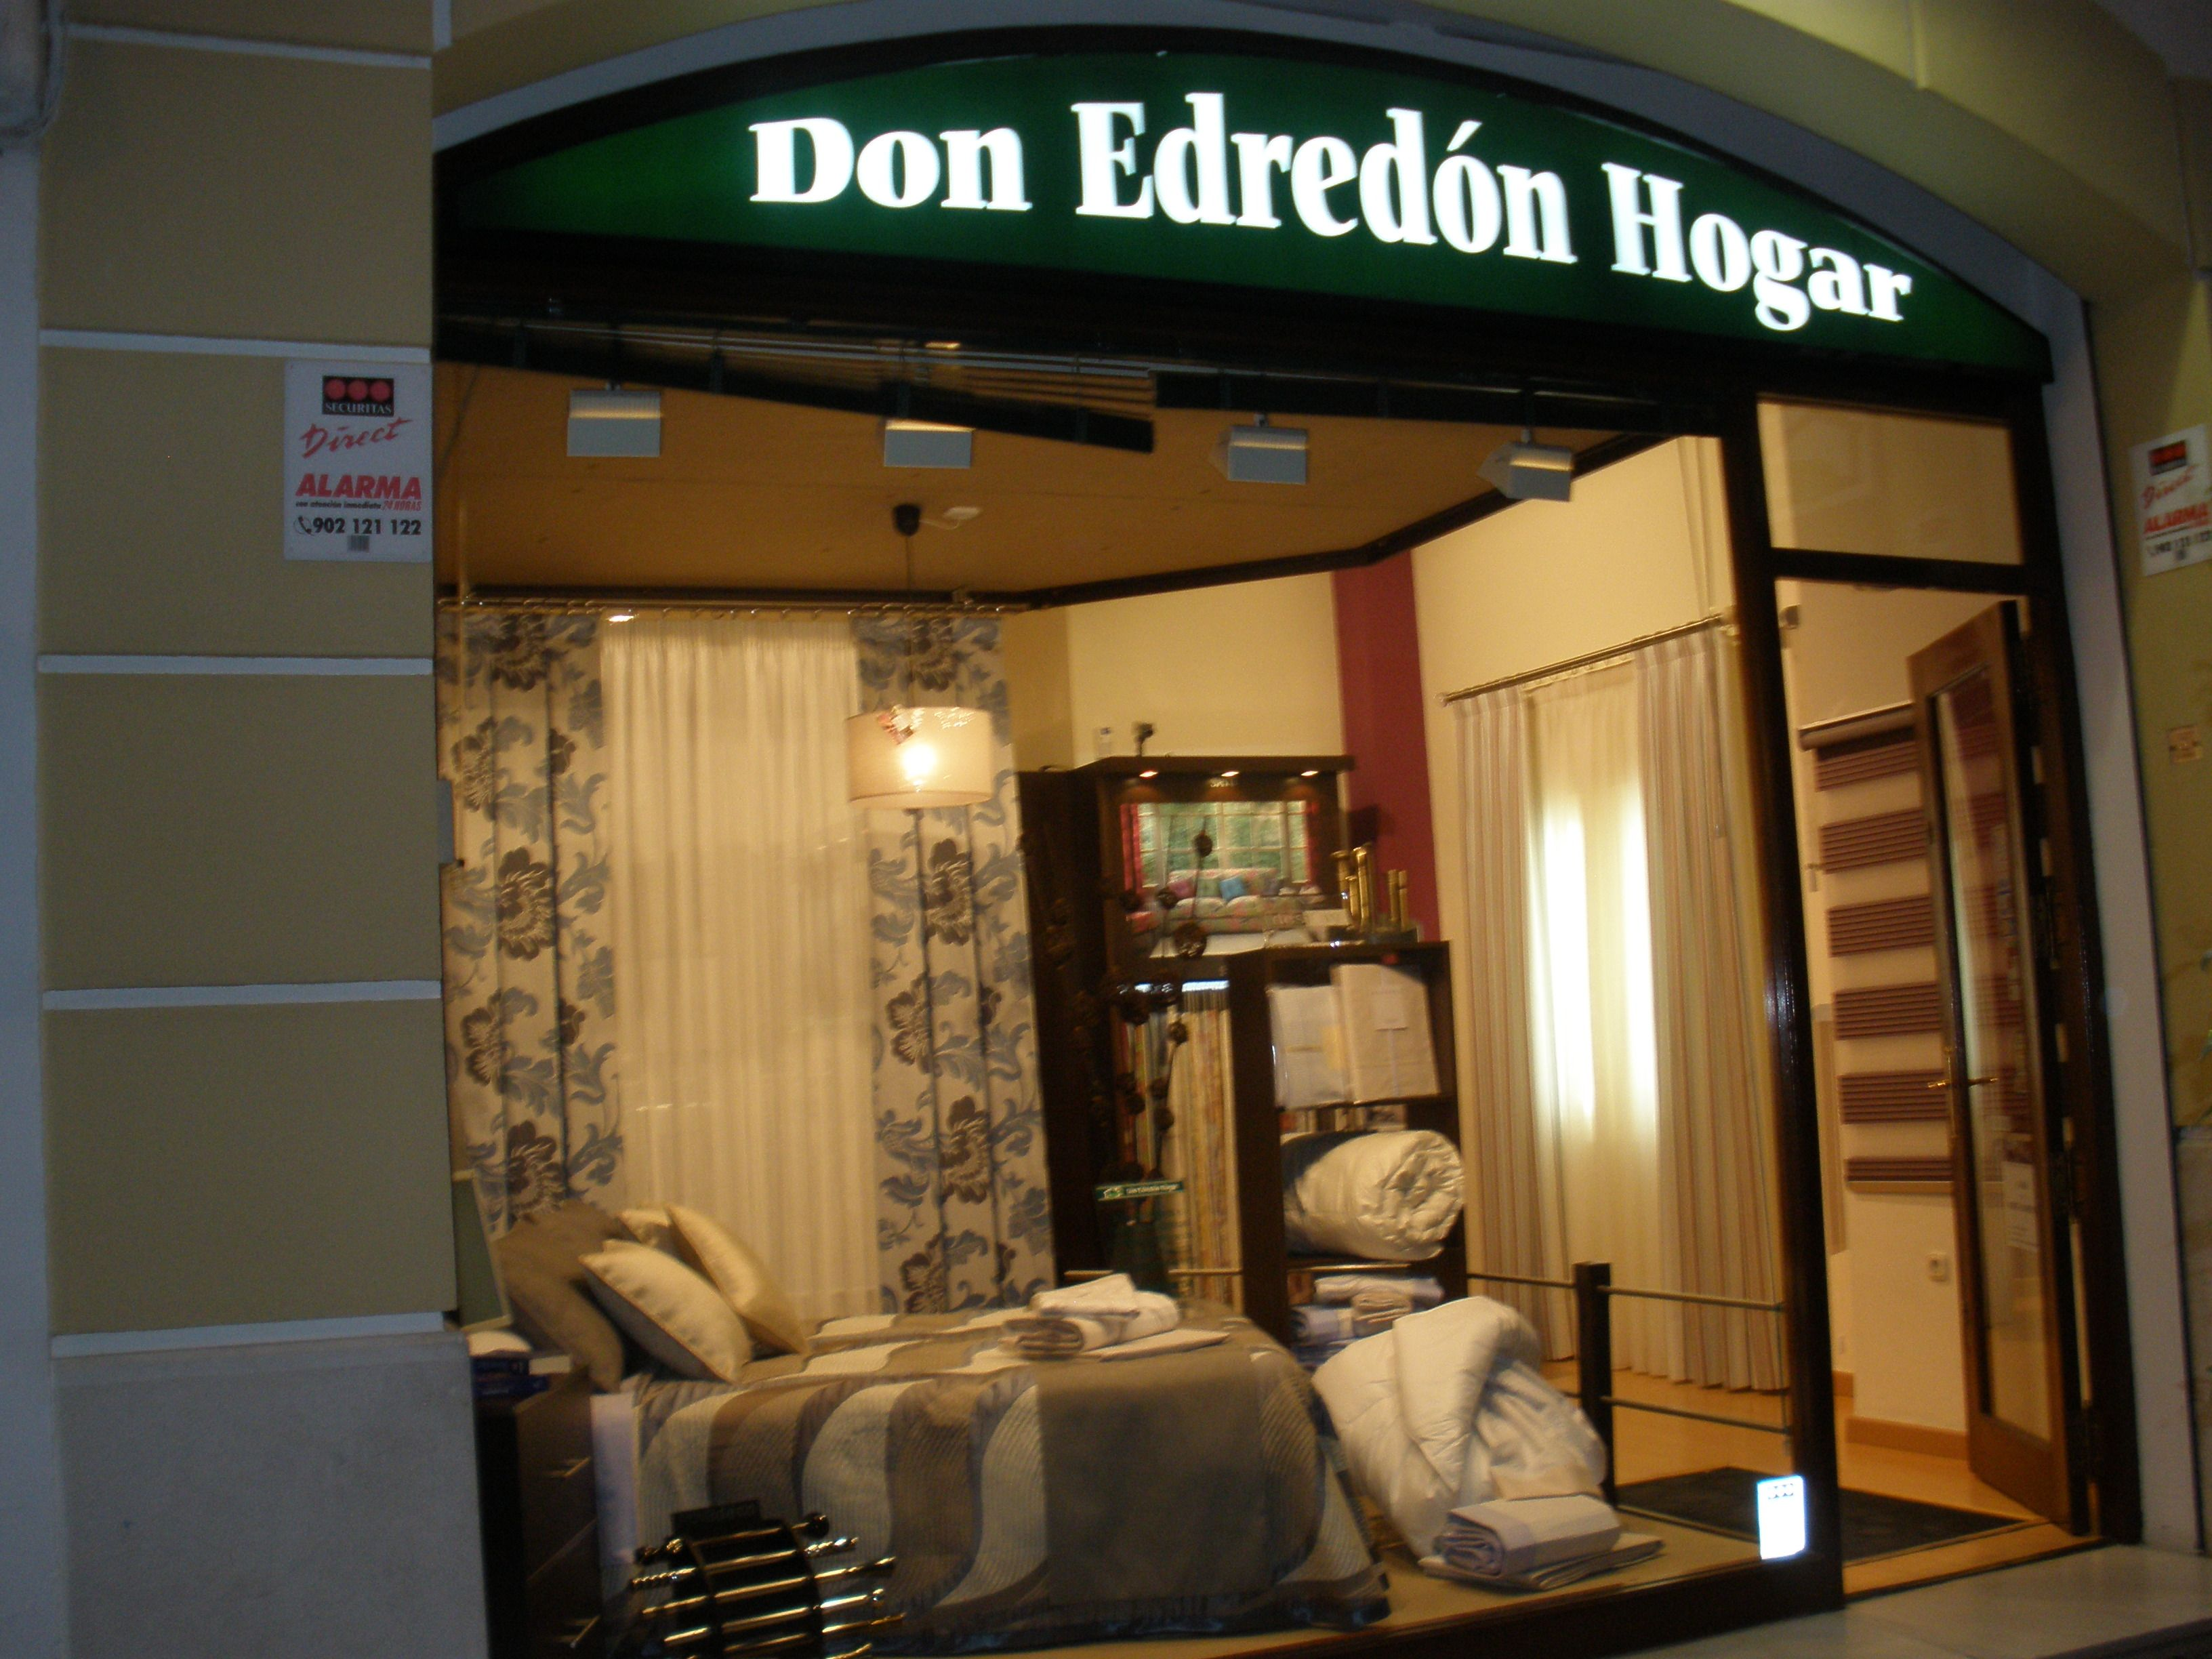 Don Edredón Hogar | AMBIENTES PARA VESTIR SU HOGAR | Pinterest